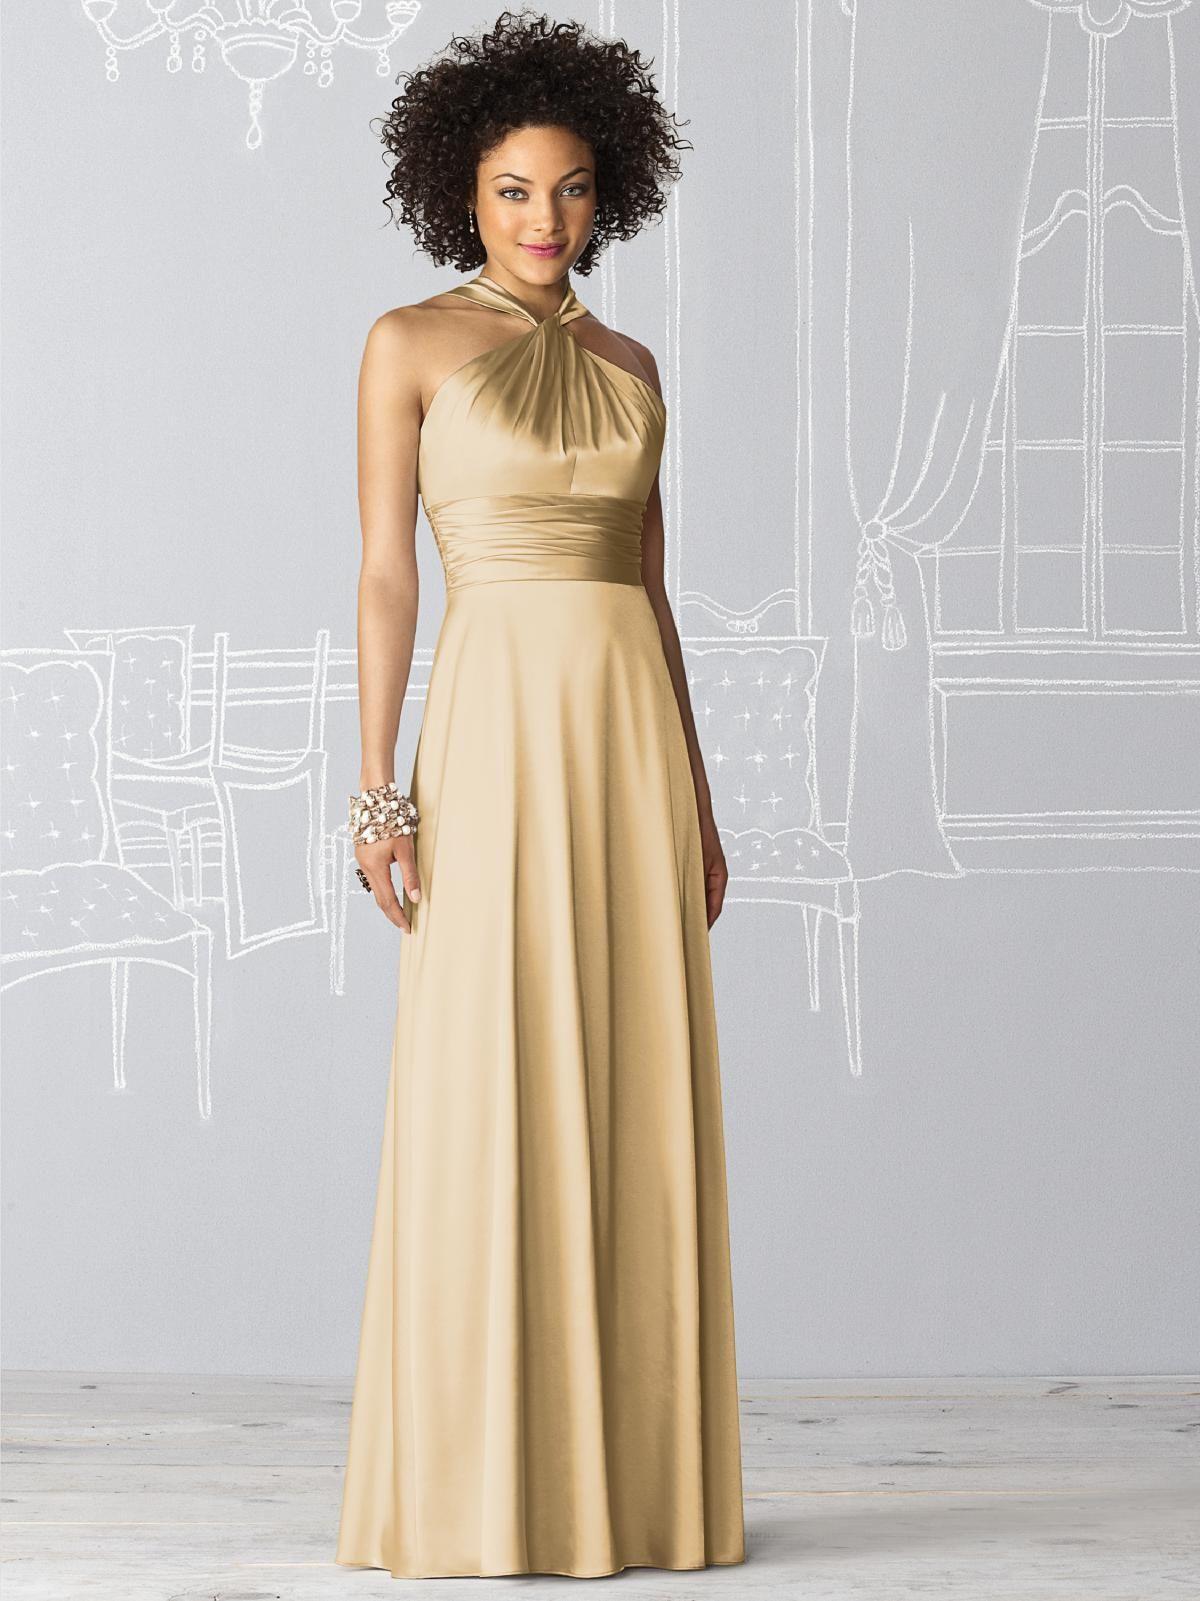 Cream dresses for weddings  Venetian Gold  soon enough uc  Pinterest  Halter gown Wedding